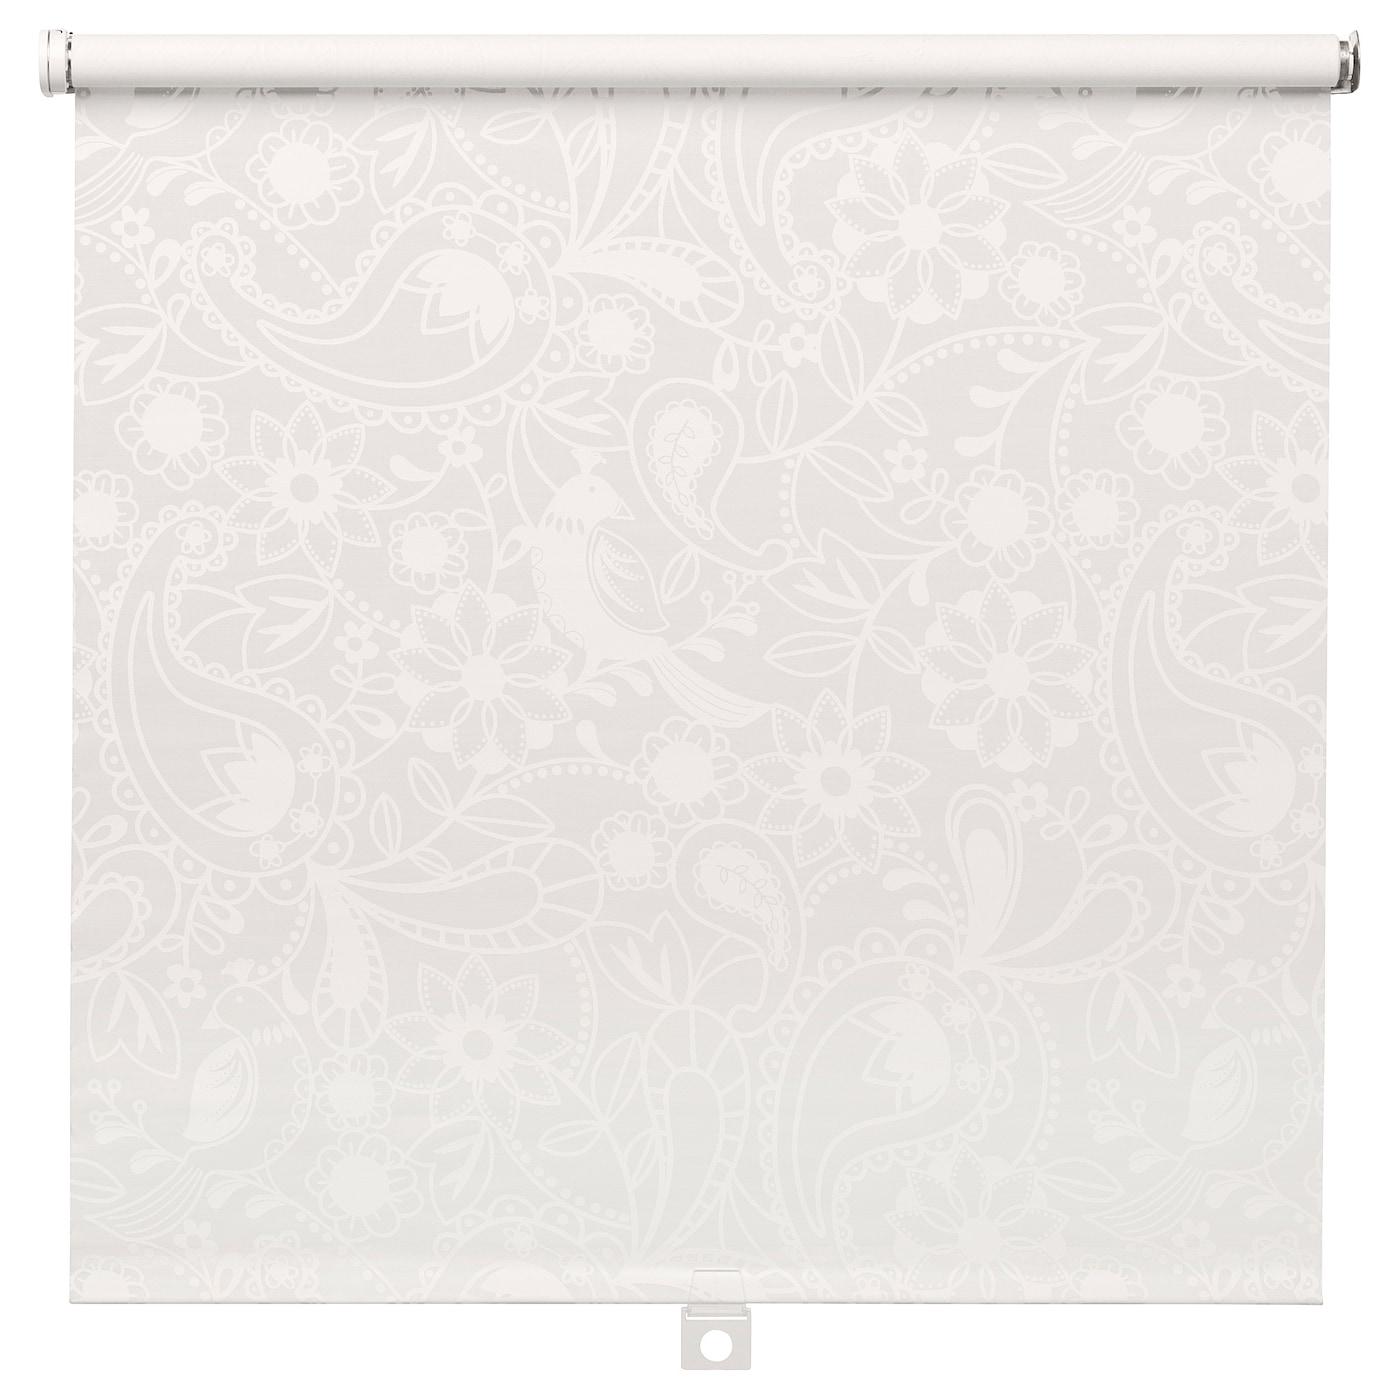 liselott store enrouleur blanc 120 x 195 cm ikea. Black Bedroom Furniture Sets. Home Design Ideas